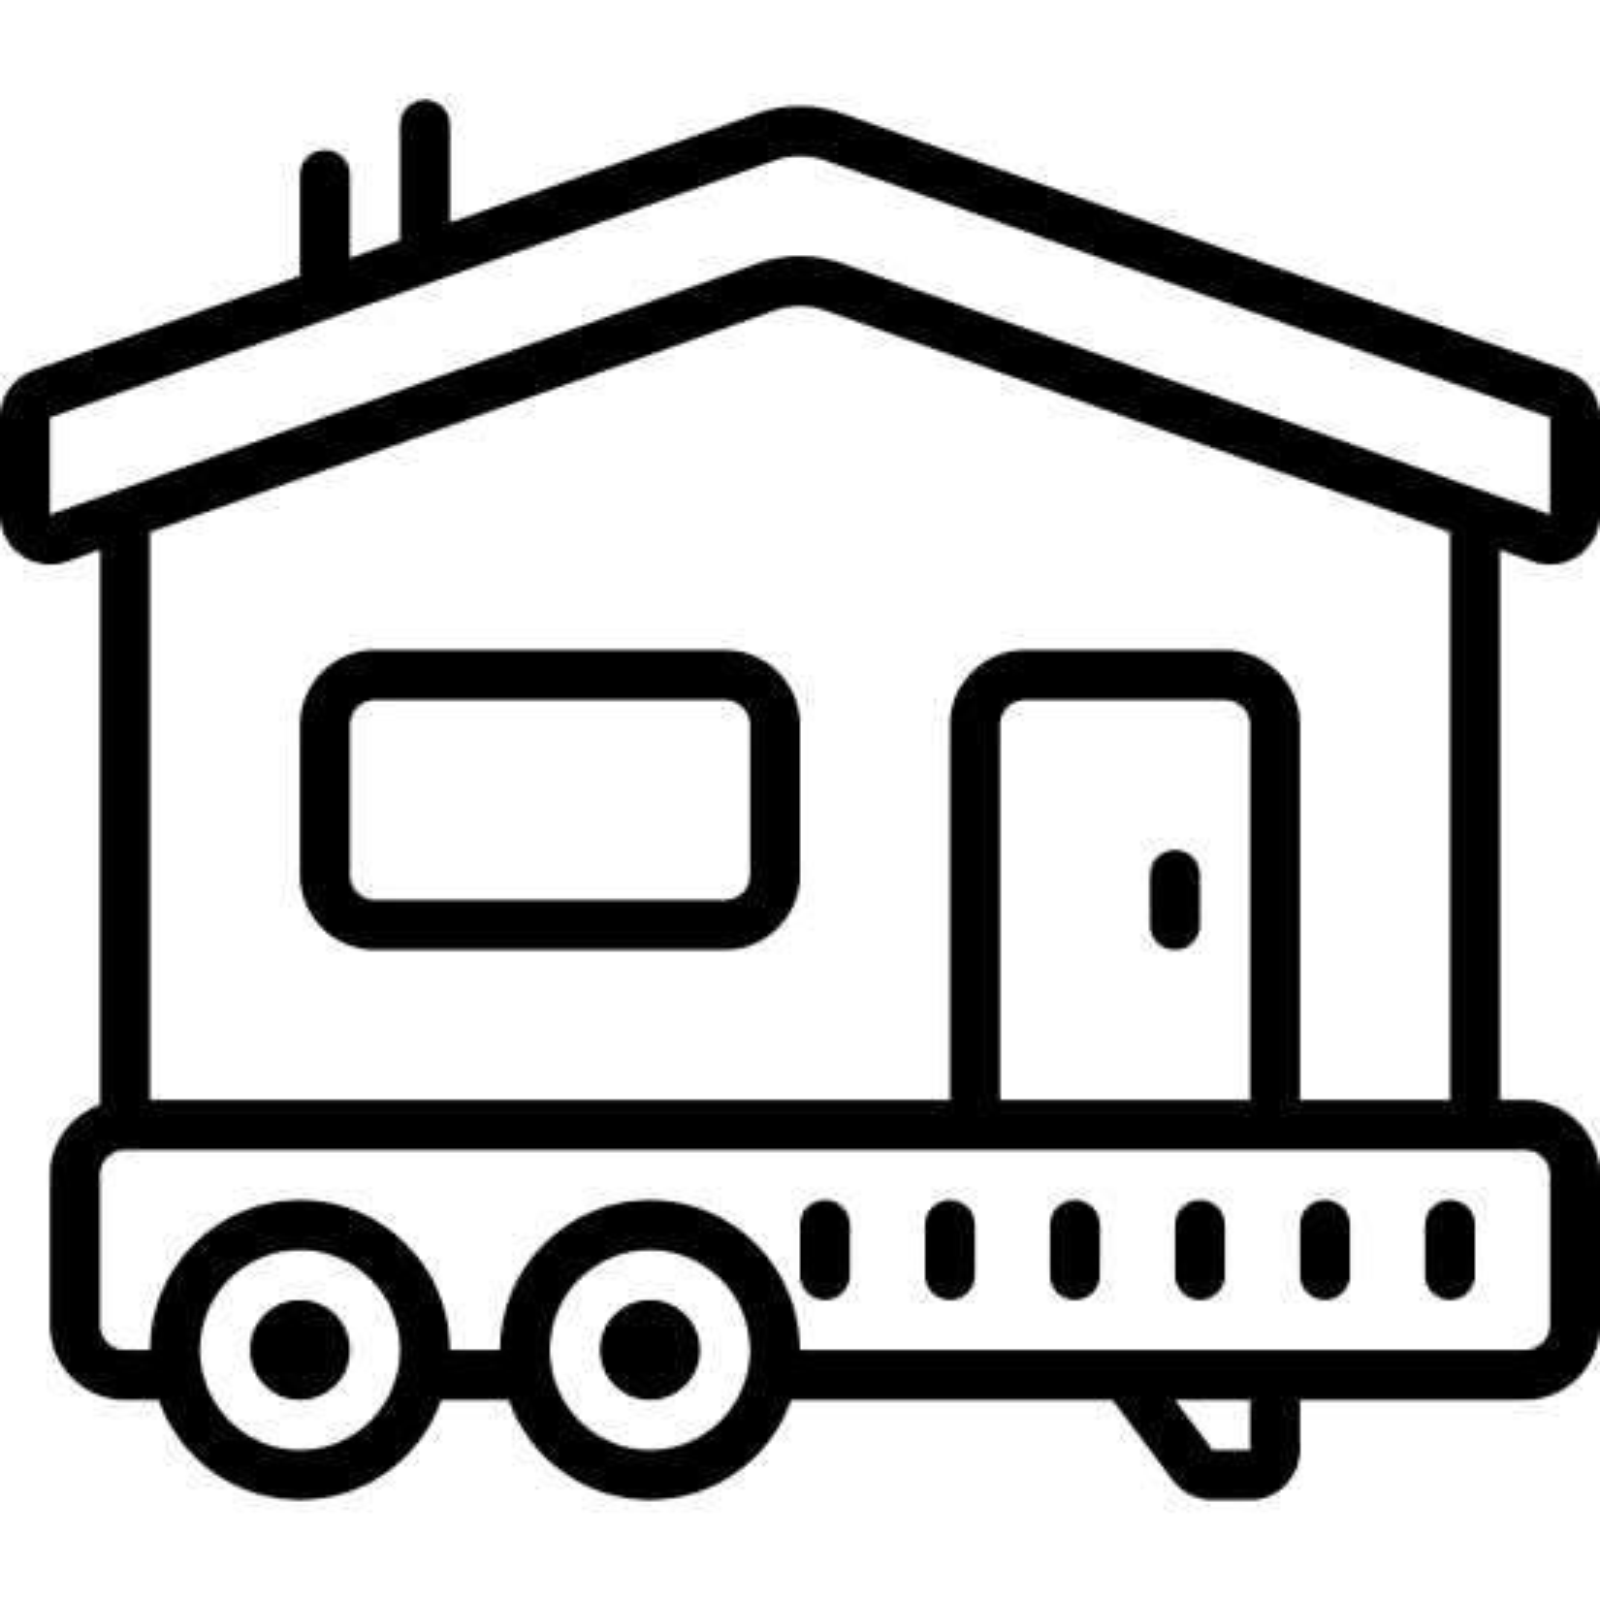 Mobile Home icon